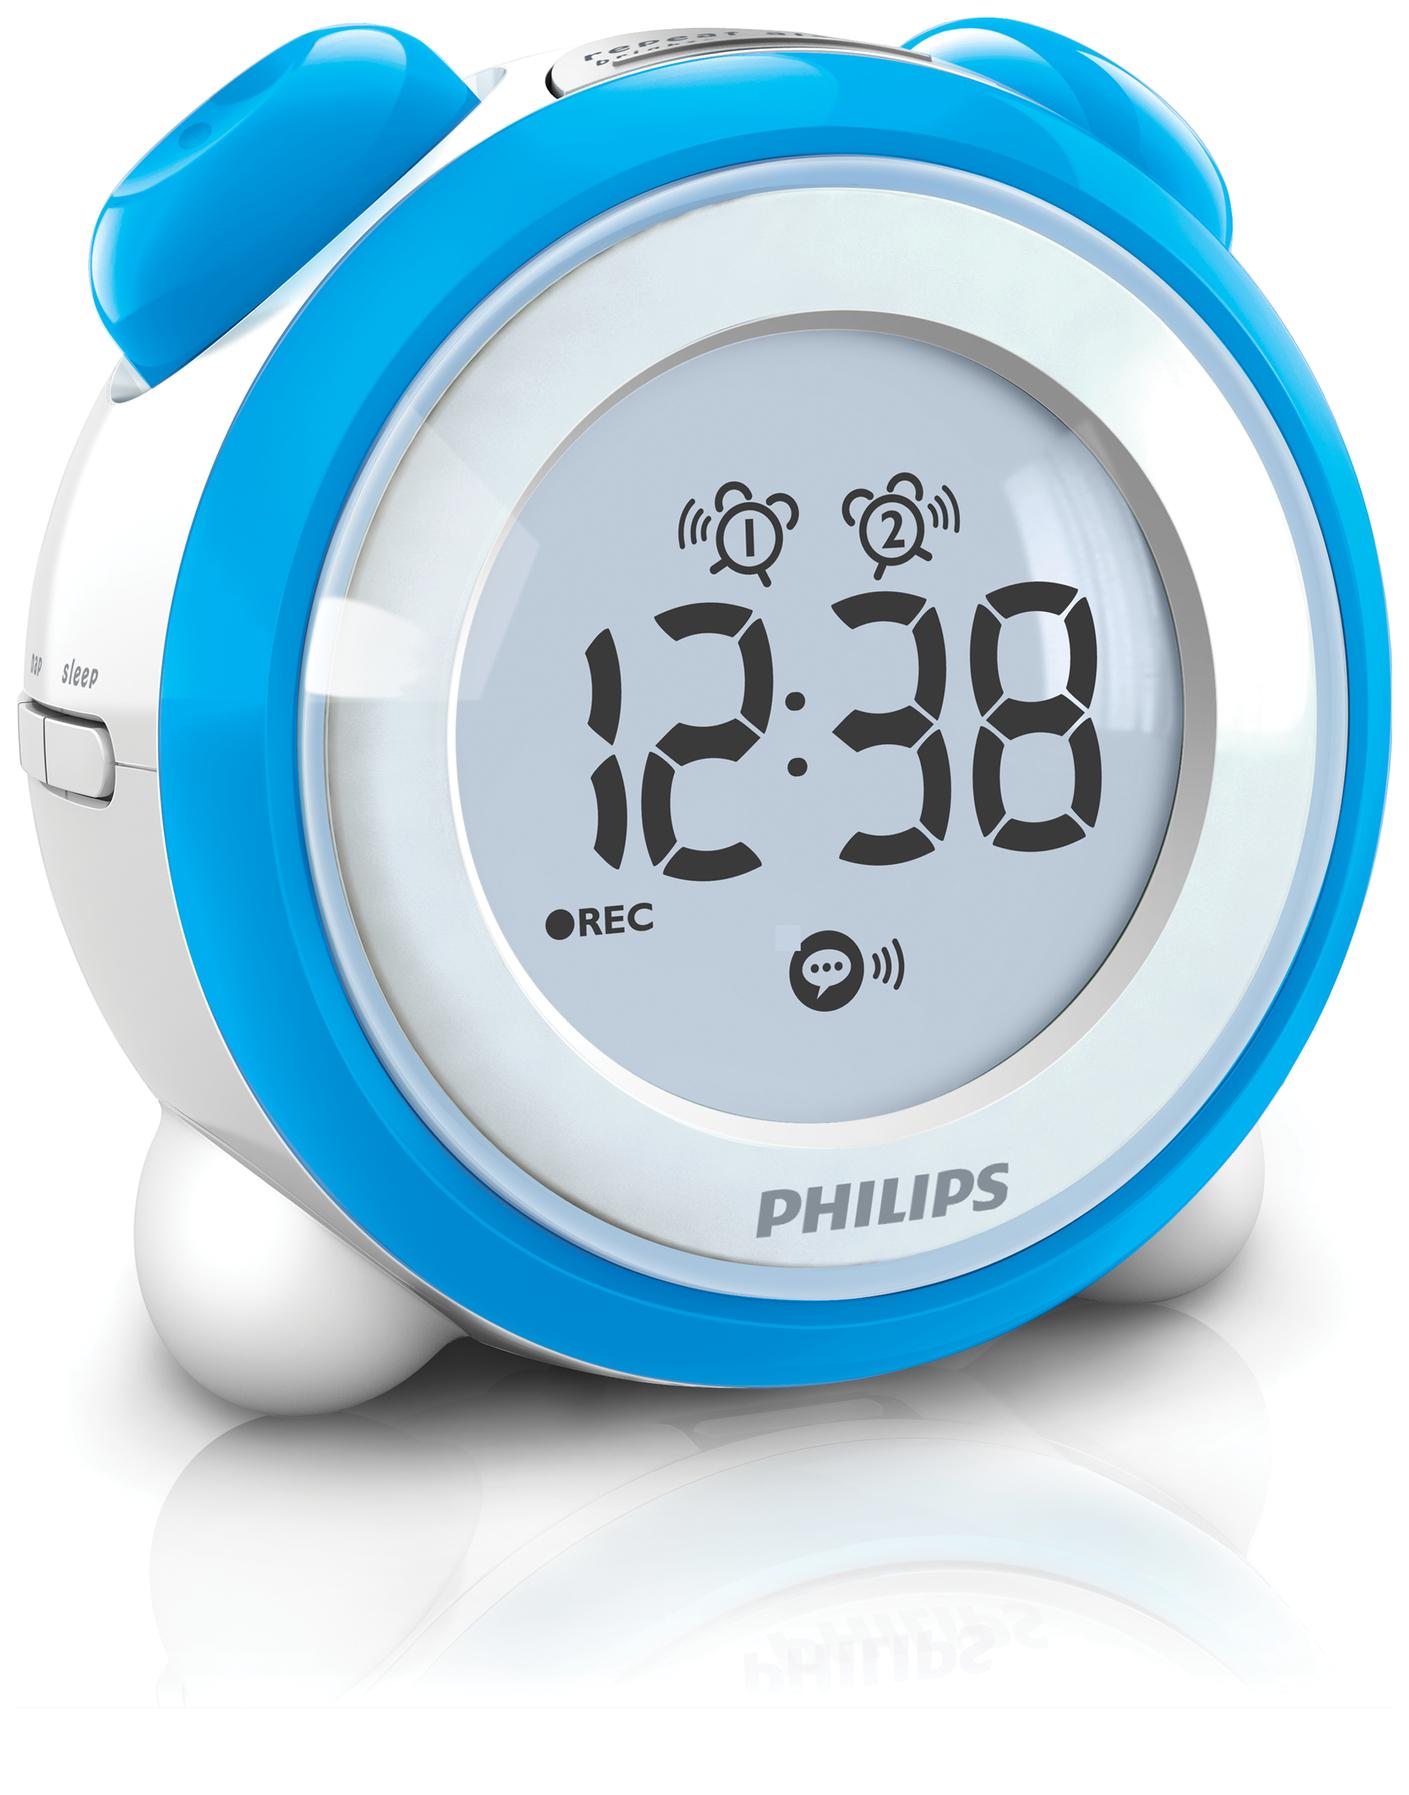 Настольные часы Philips от RBT.ru